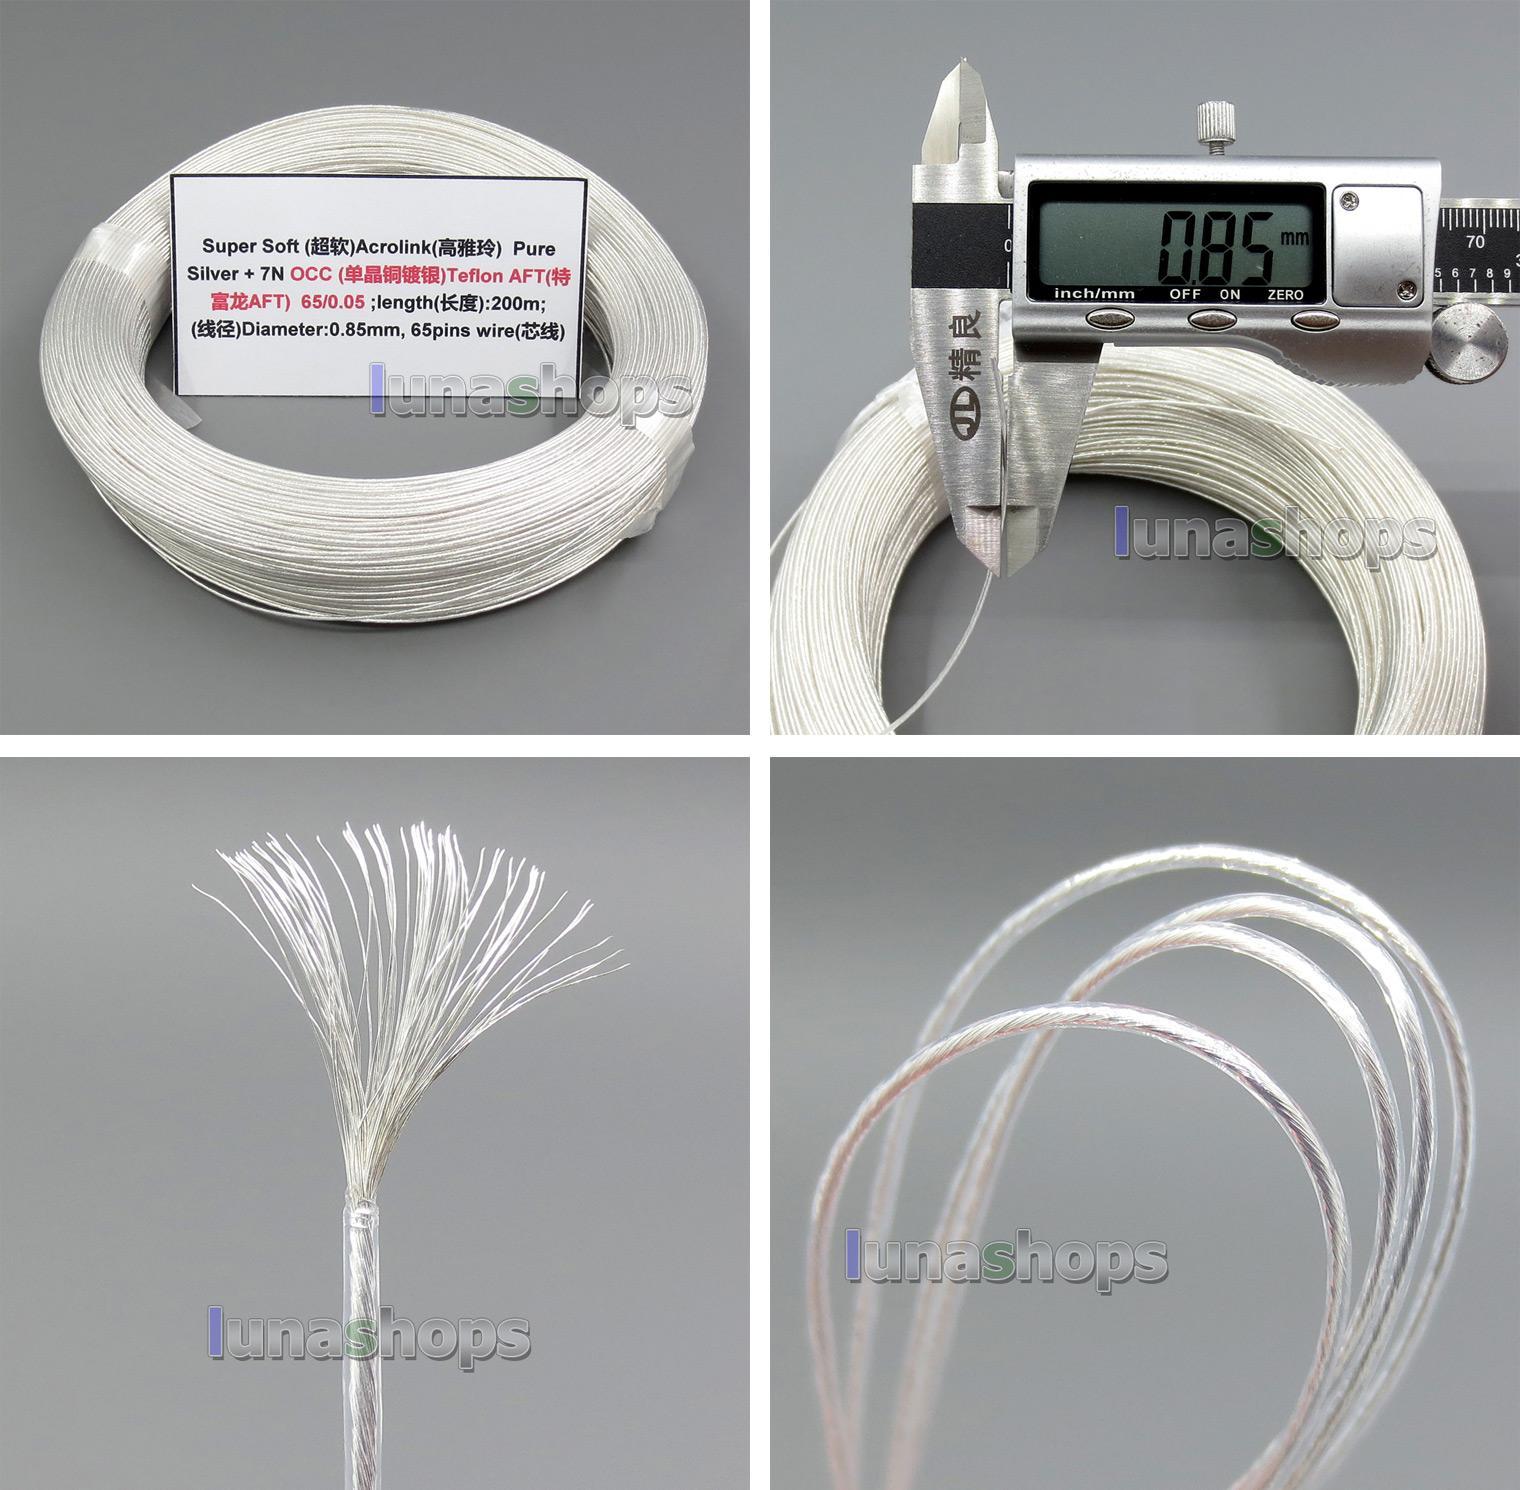 Kabel Bestellen 200m 26awg Ag99.9% Acrolink Reines Silber + 7n Occ ...